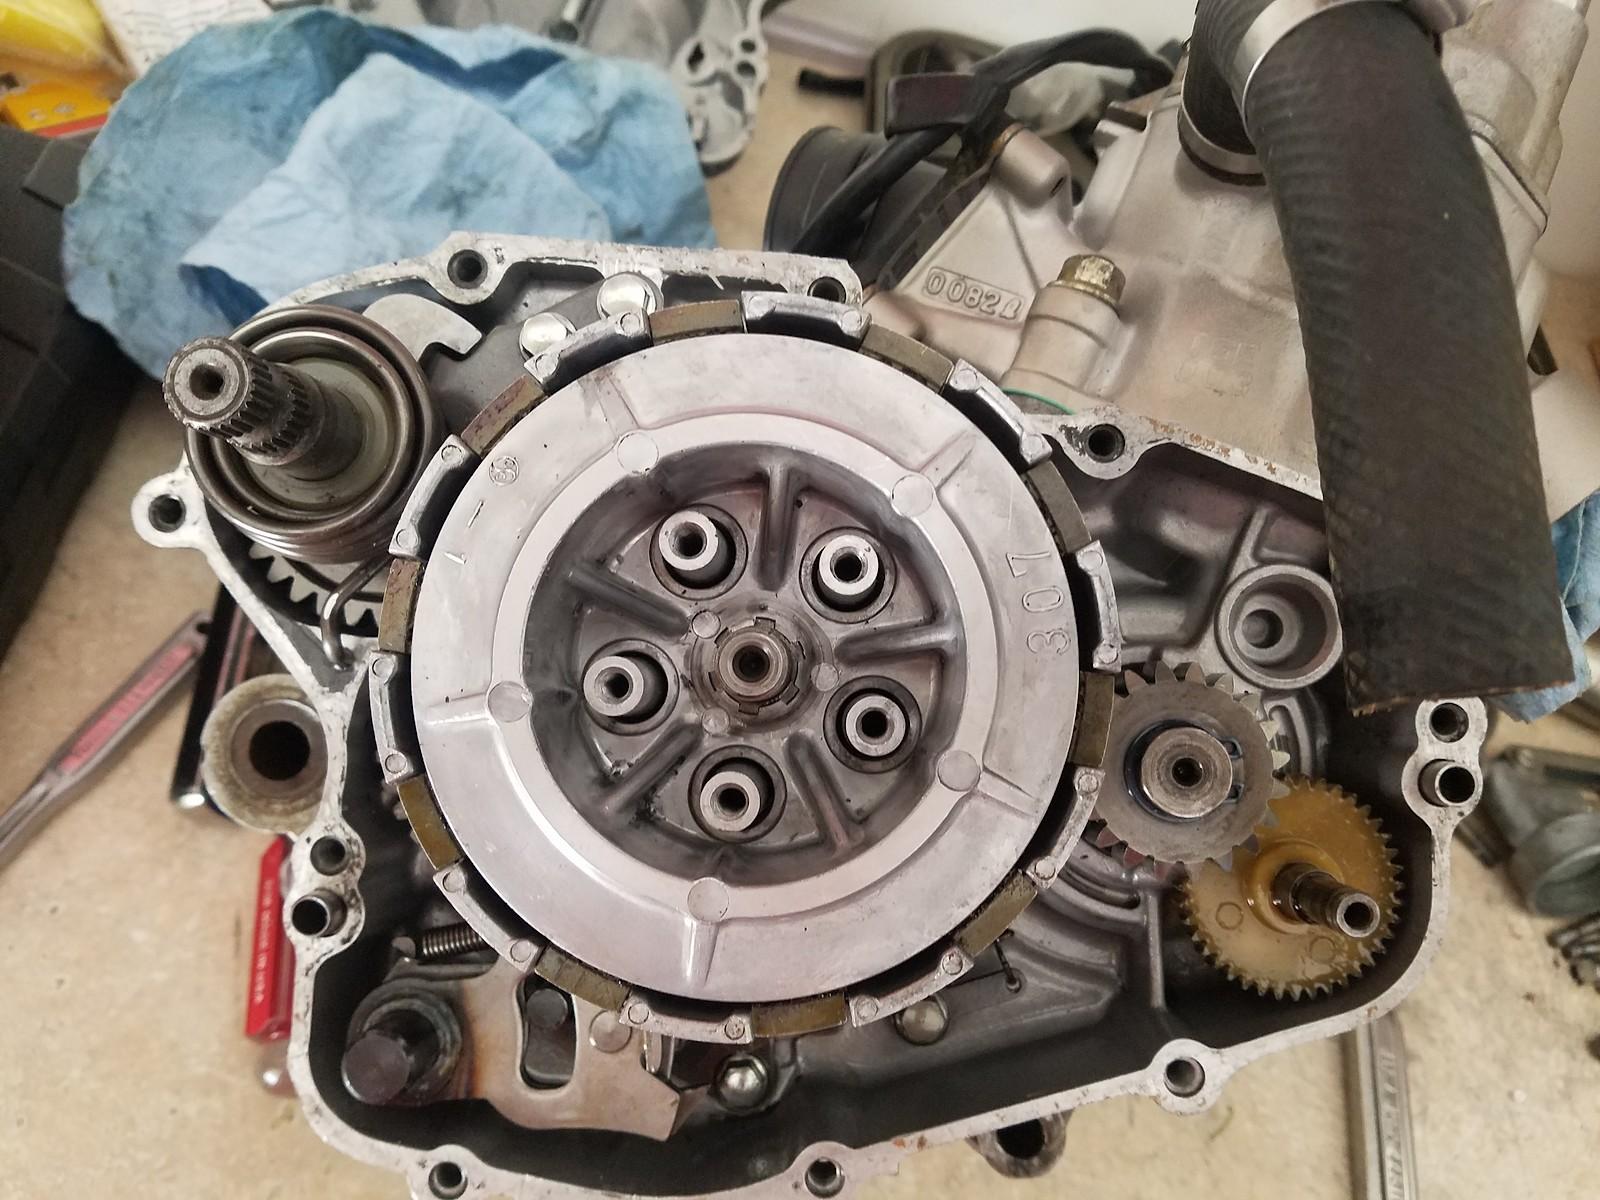 KX80 Clutch basket removal - Tech Help/Race Shop - Motocross